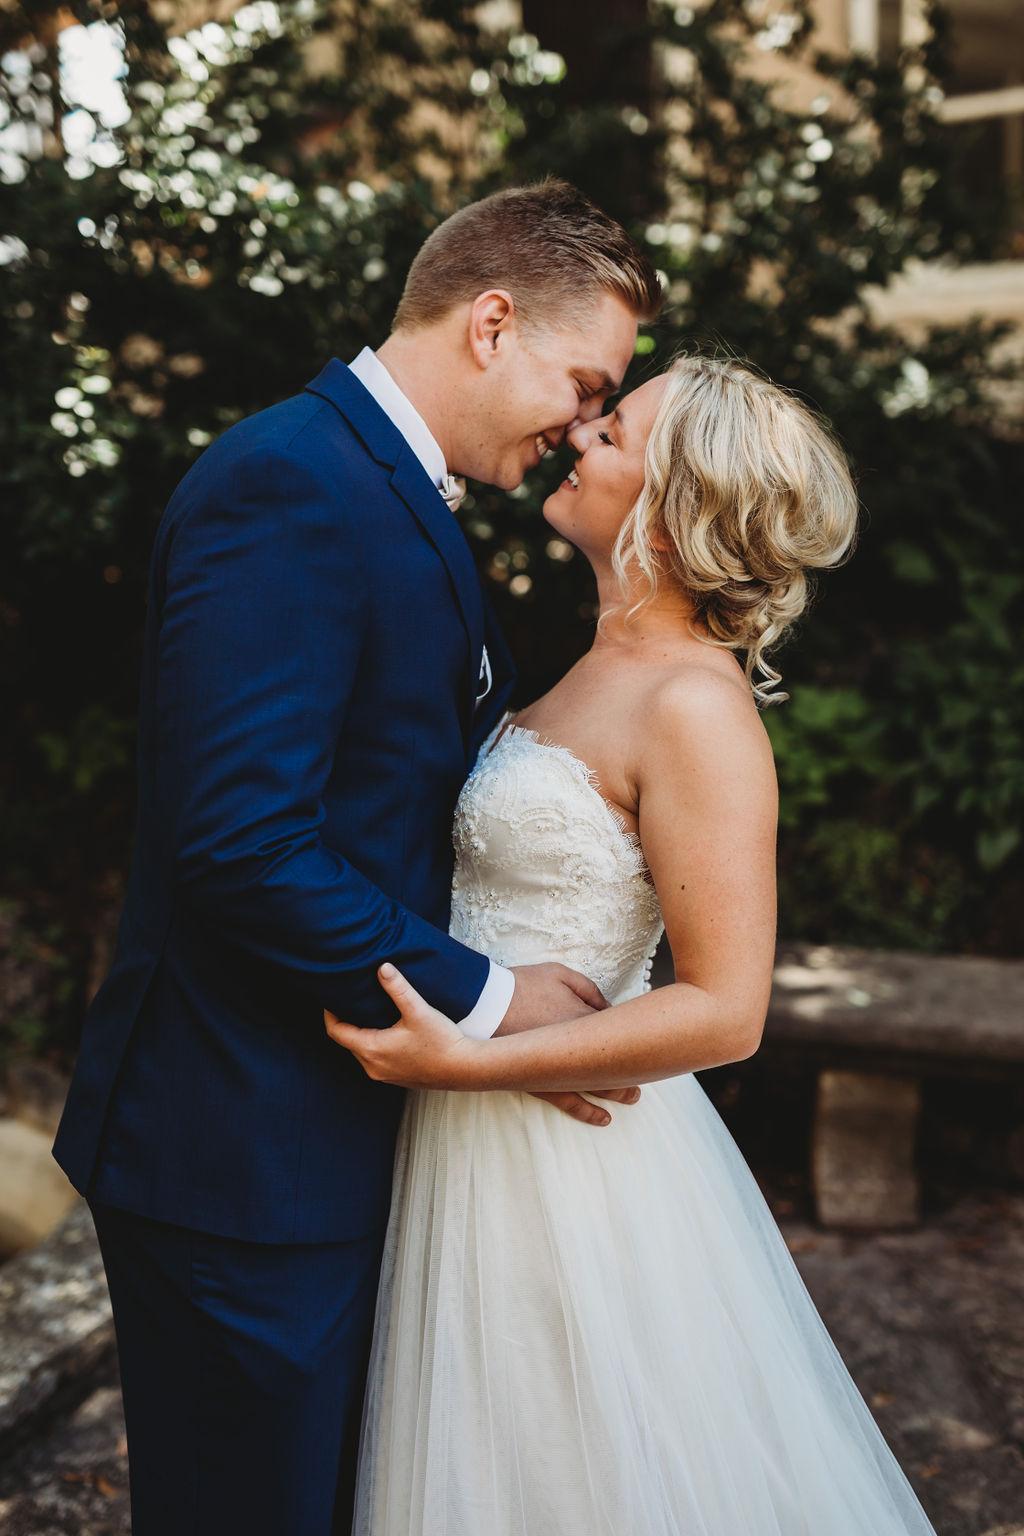 engle-olson-katie-dalton-wedding-clewell-photography-19.jpg